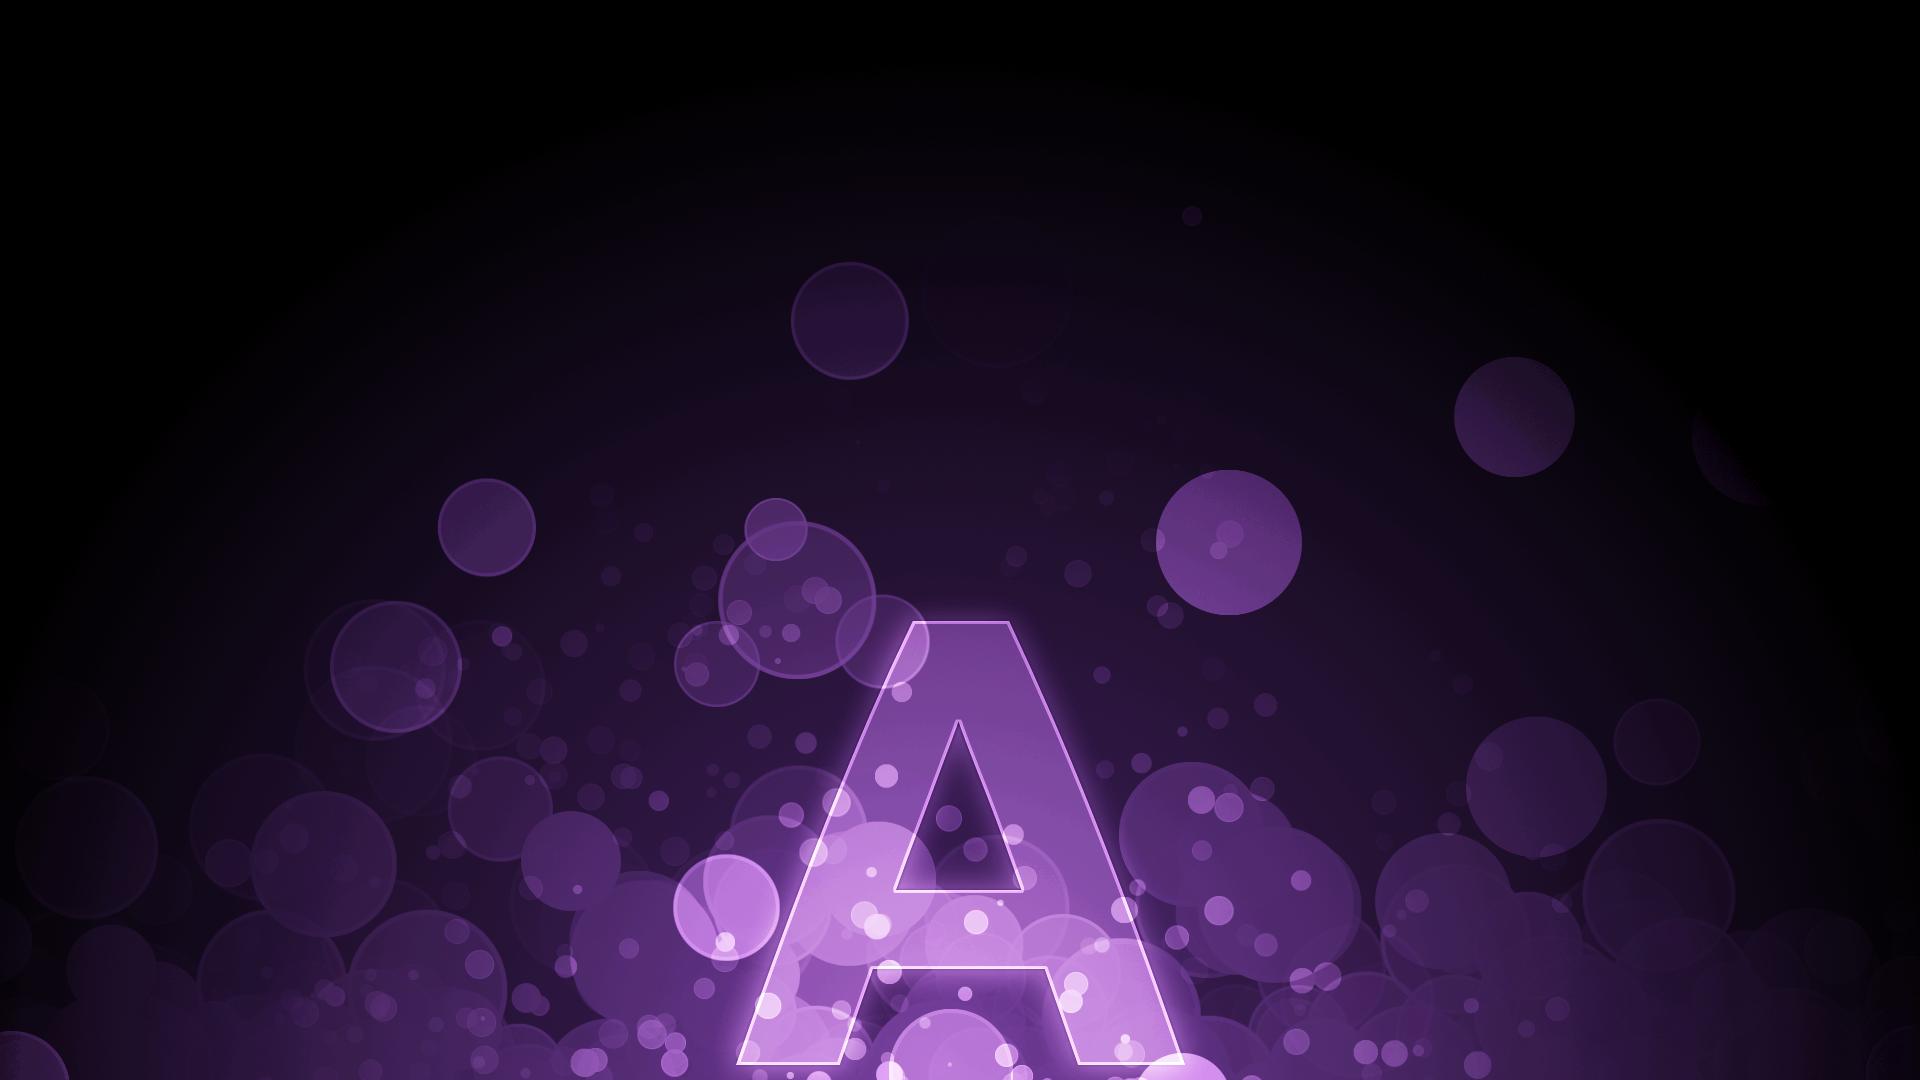 purple circles a wallpaper by defectivedre on deviantart